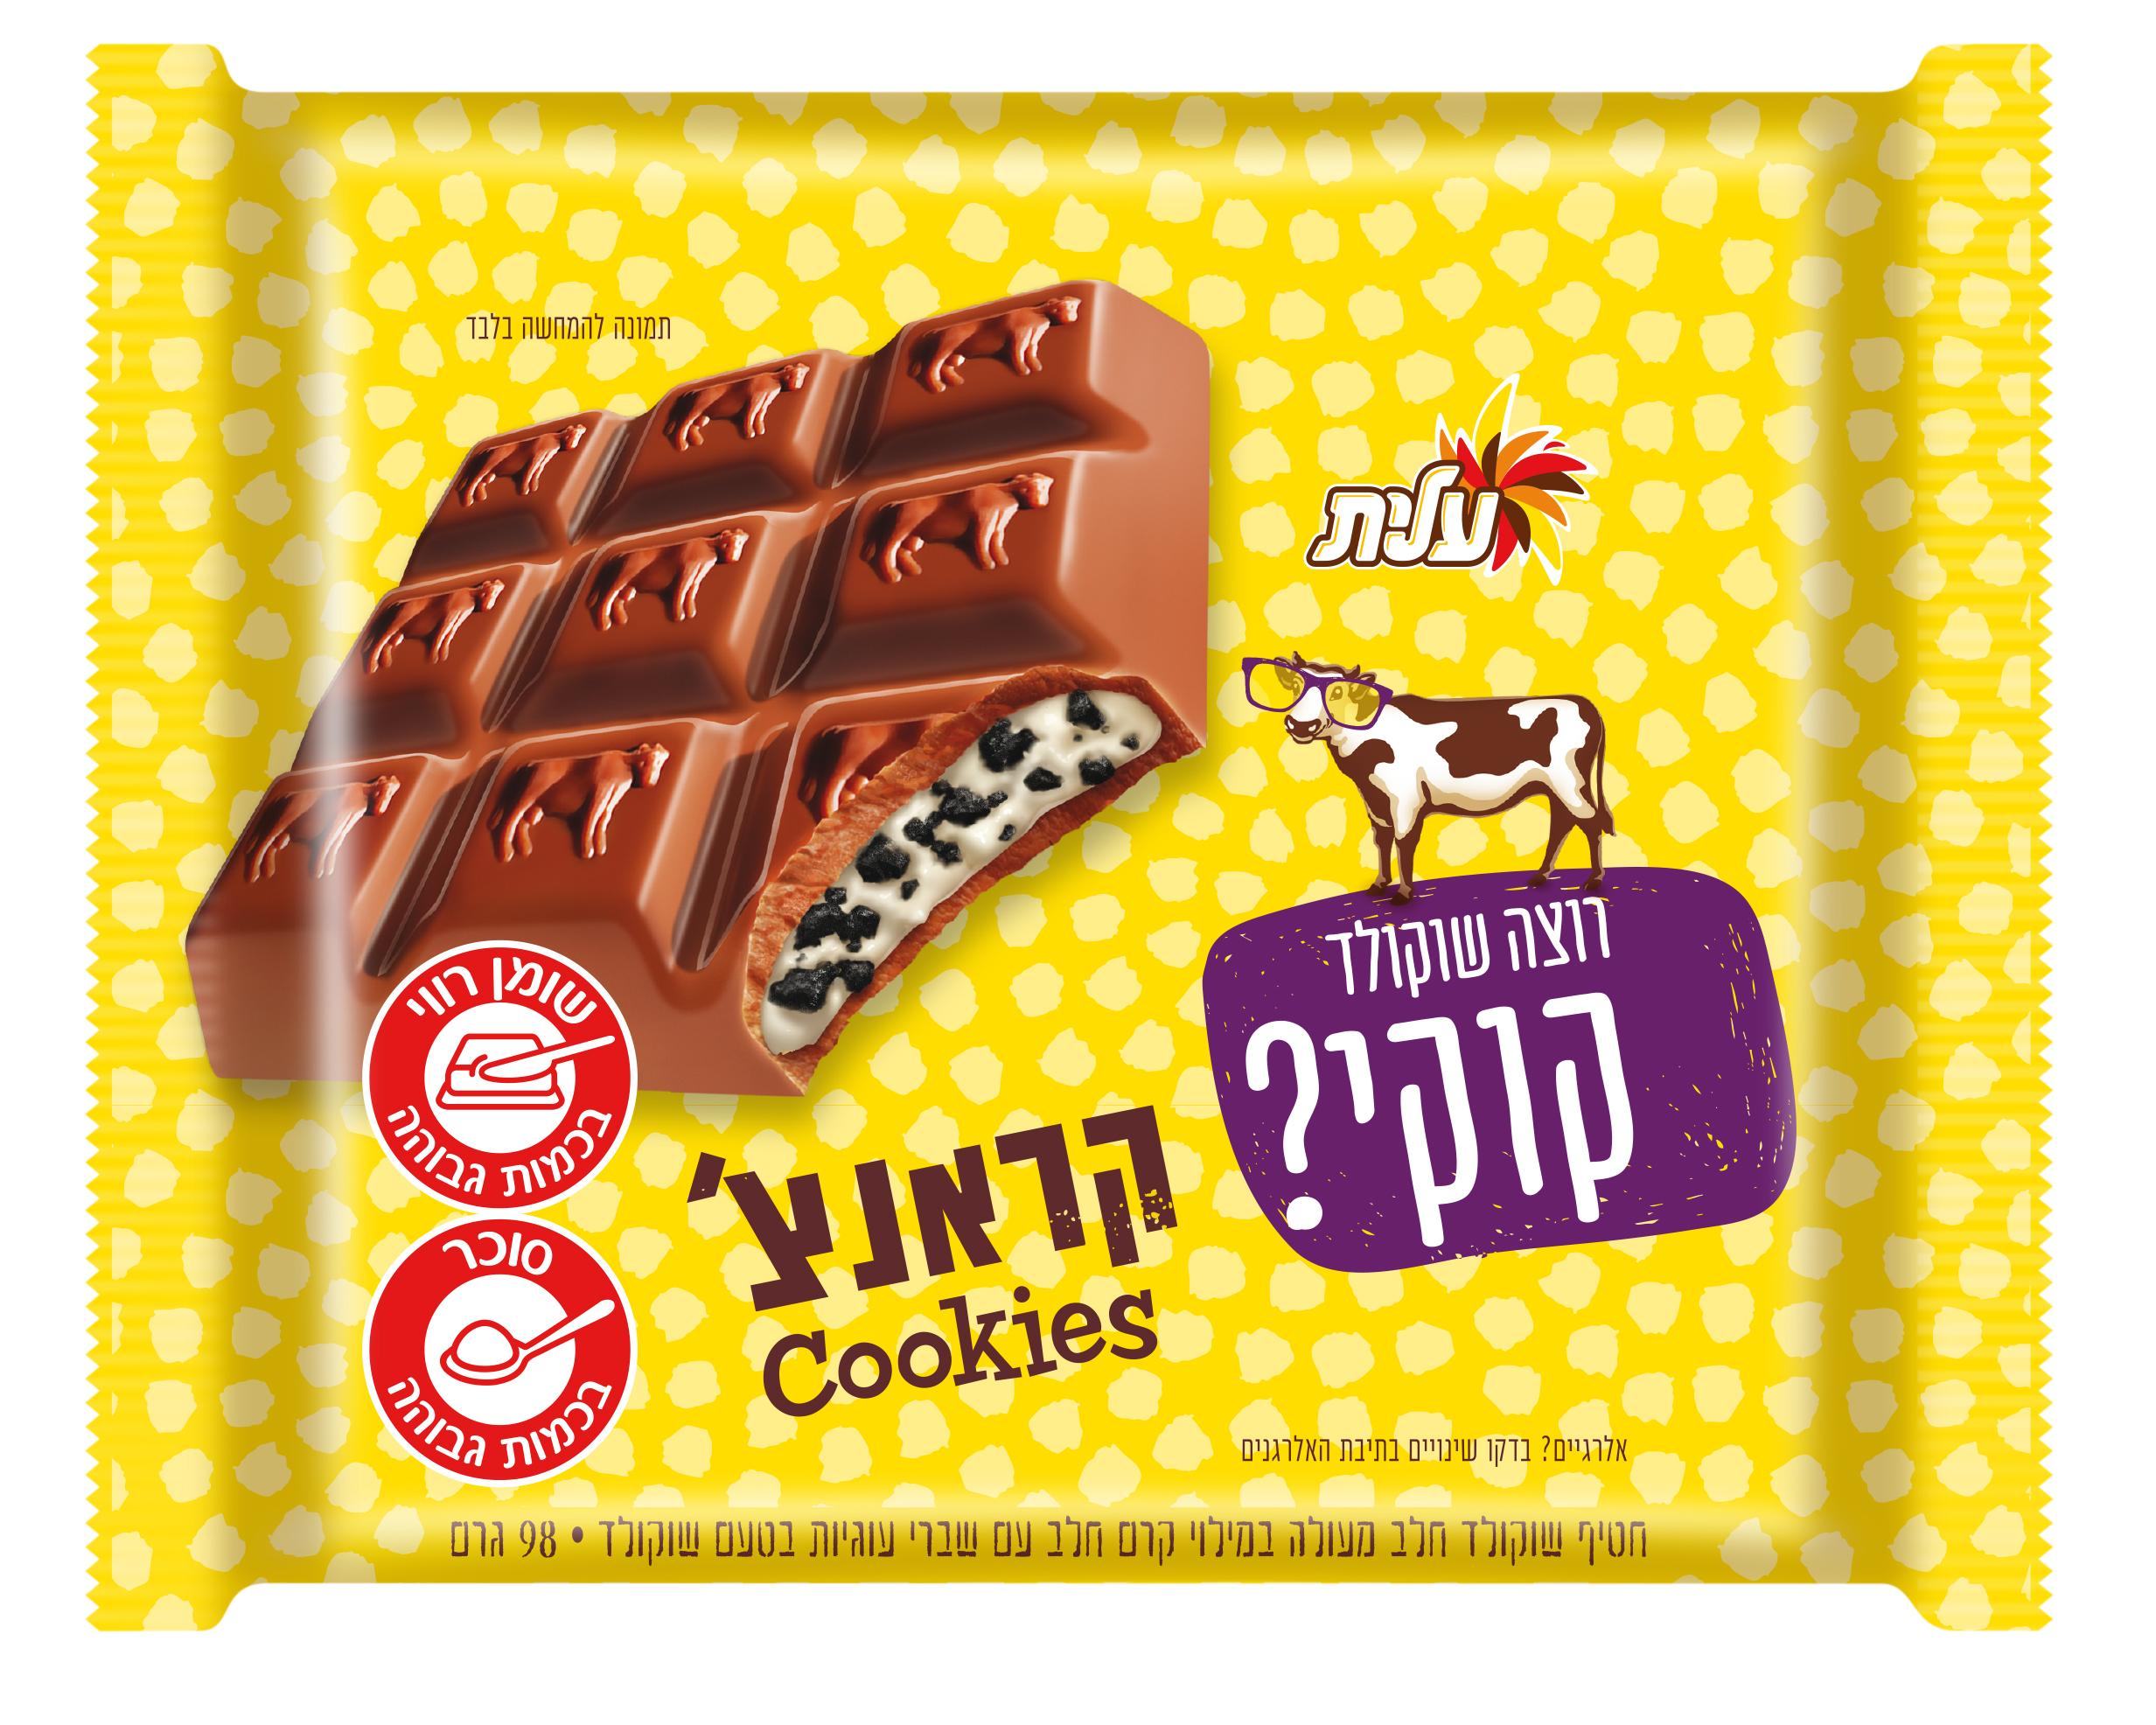 קראנצ' cookies